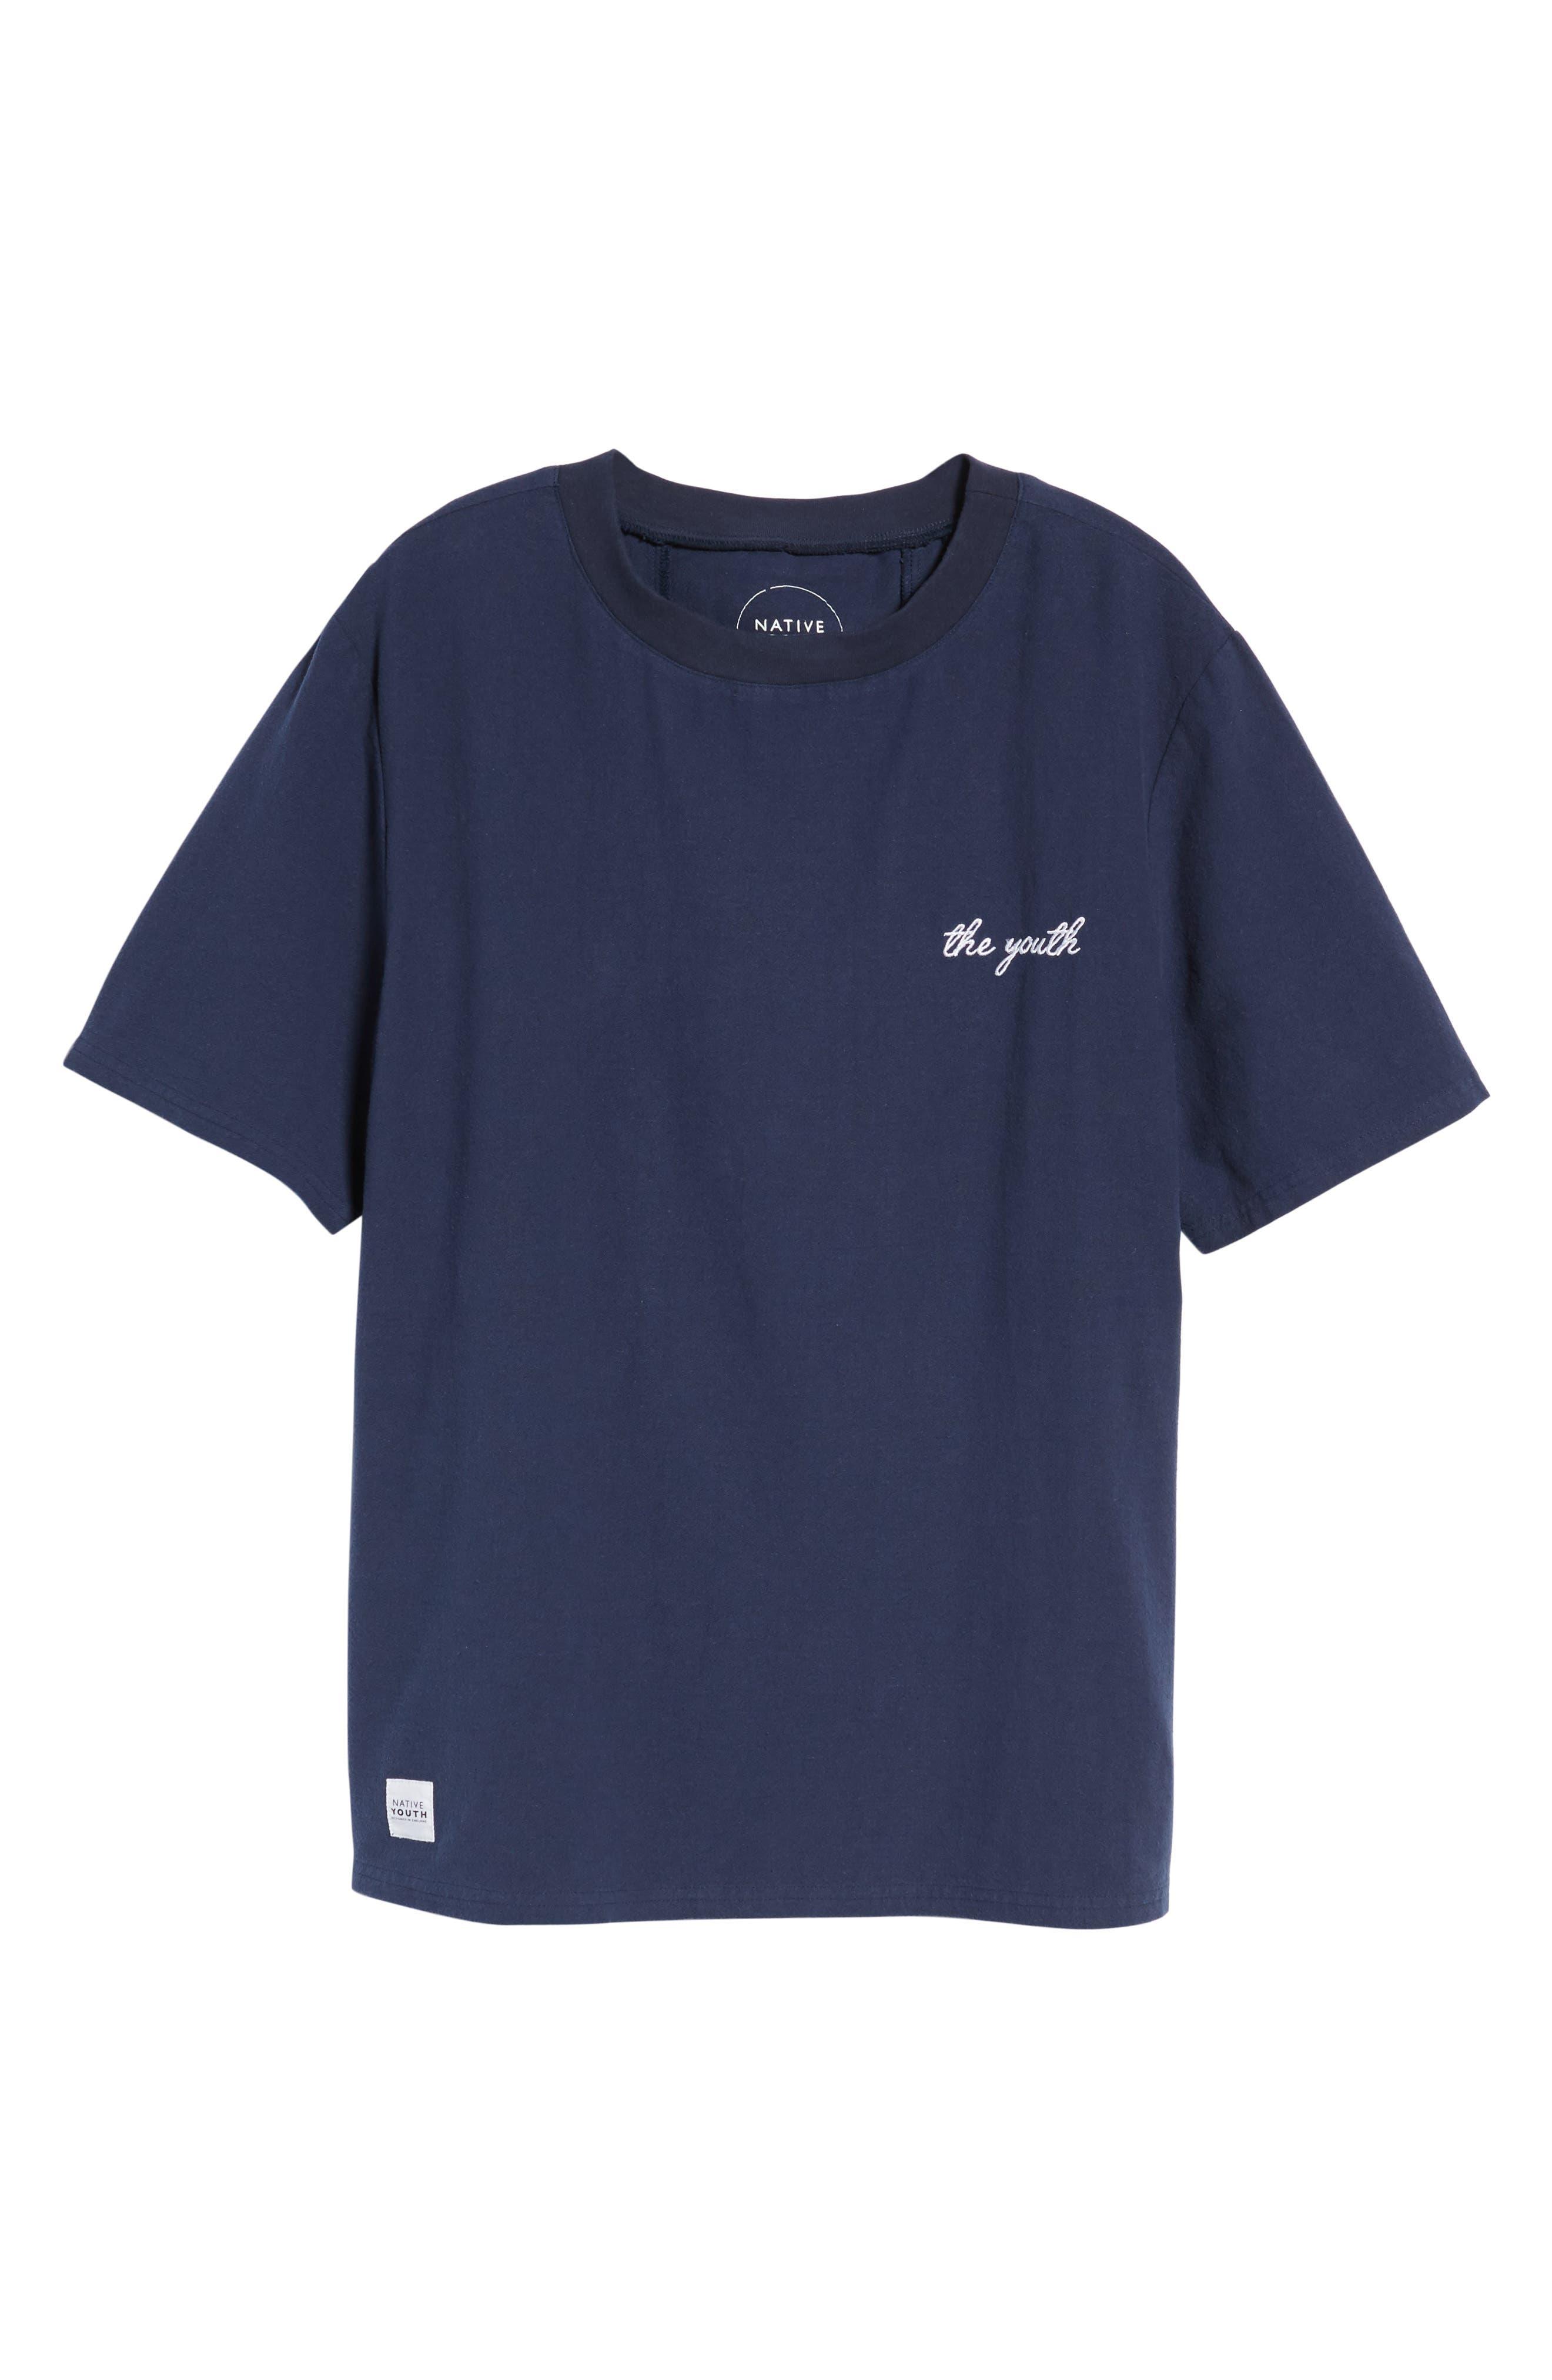 Broads Woven T-Shirt,                             Alternate thumbnail 6, color,                             400